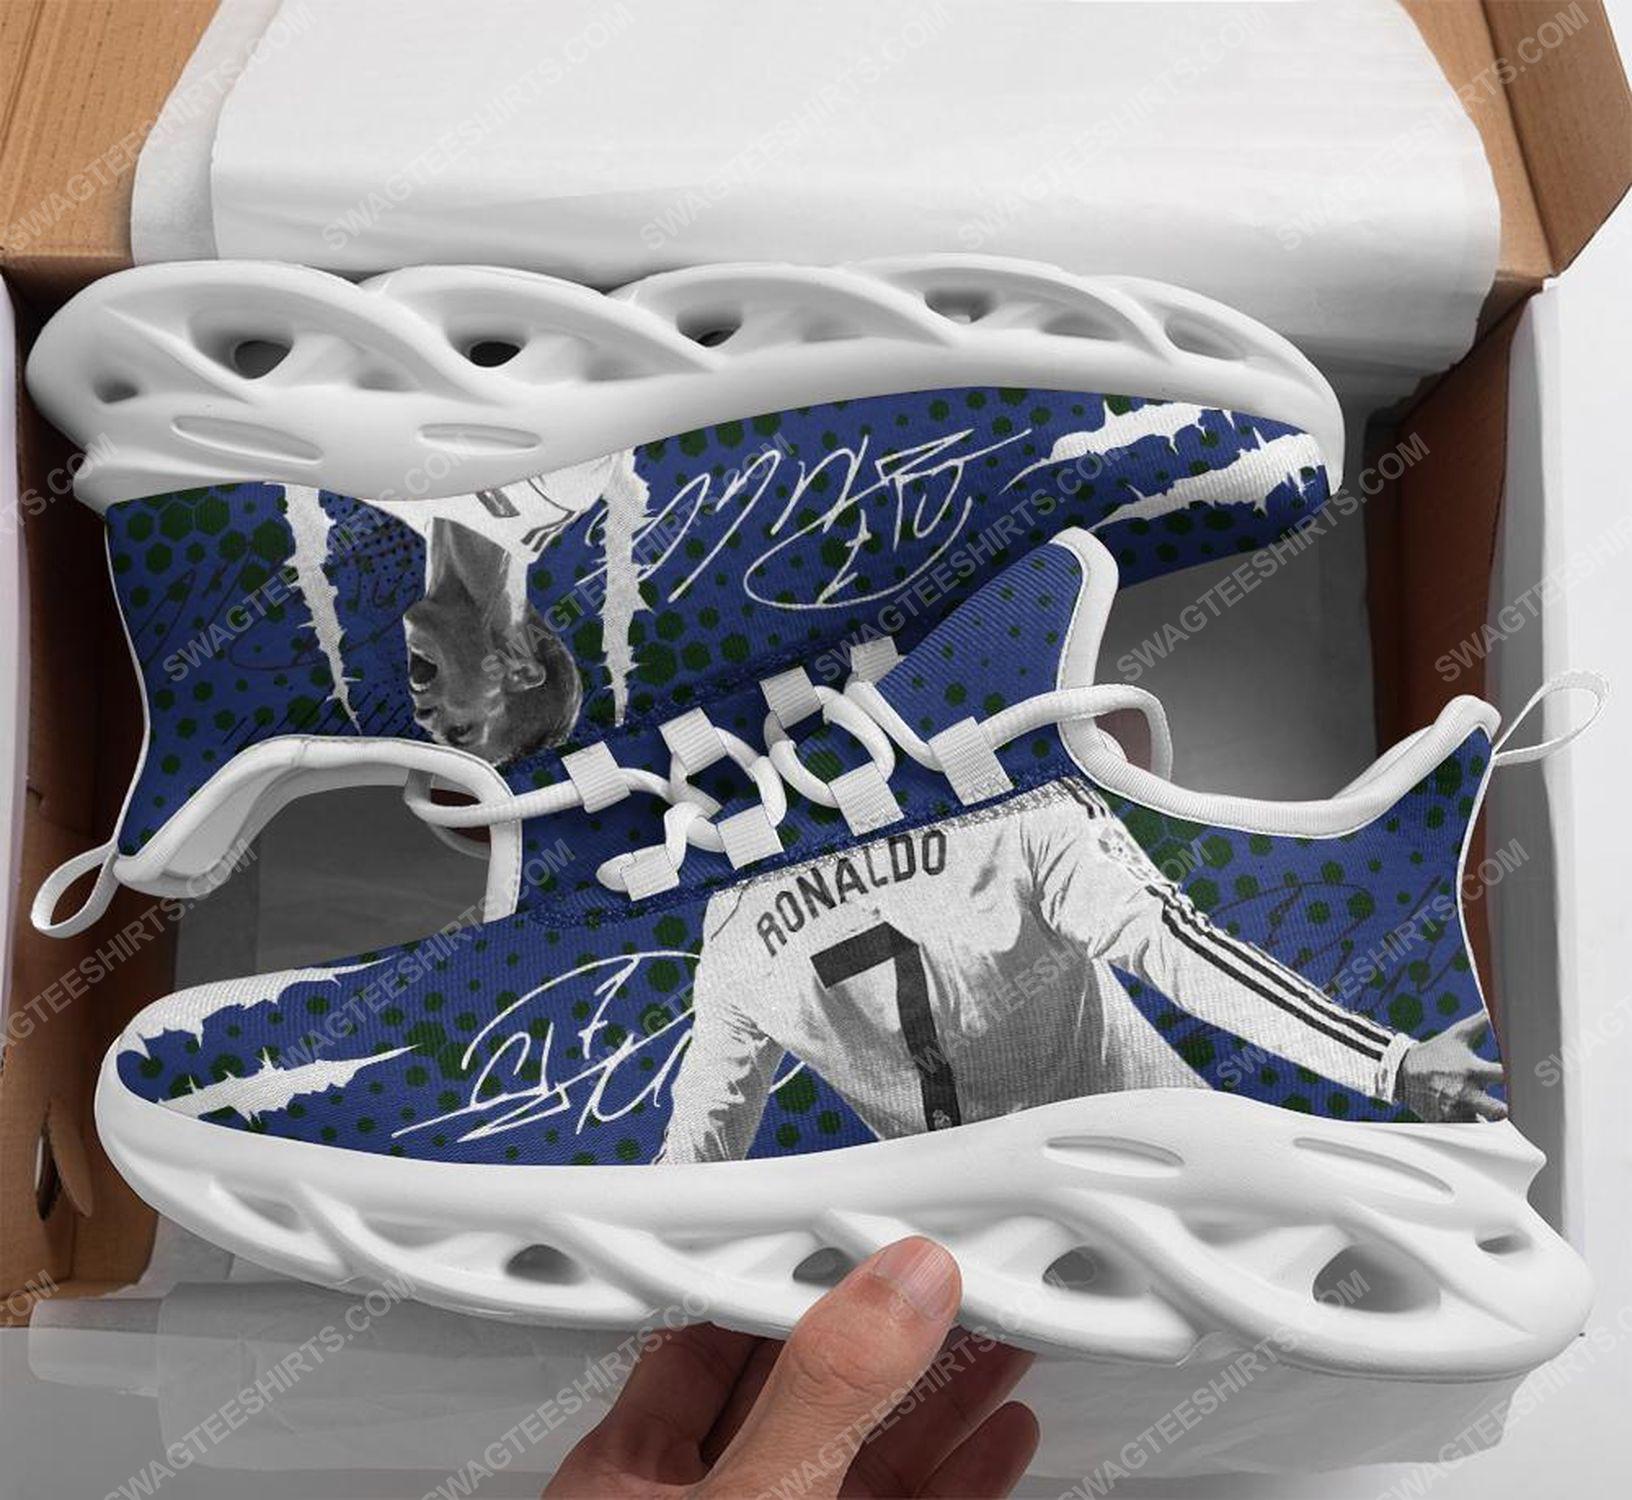 Cristiano ronaldo cr7 signature max soul shoes 1